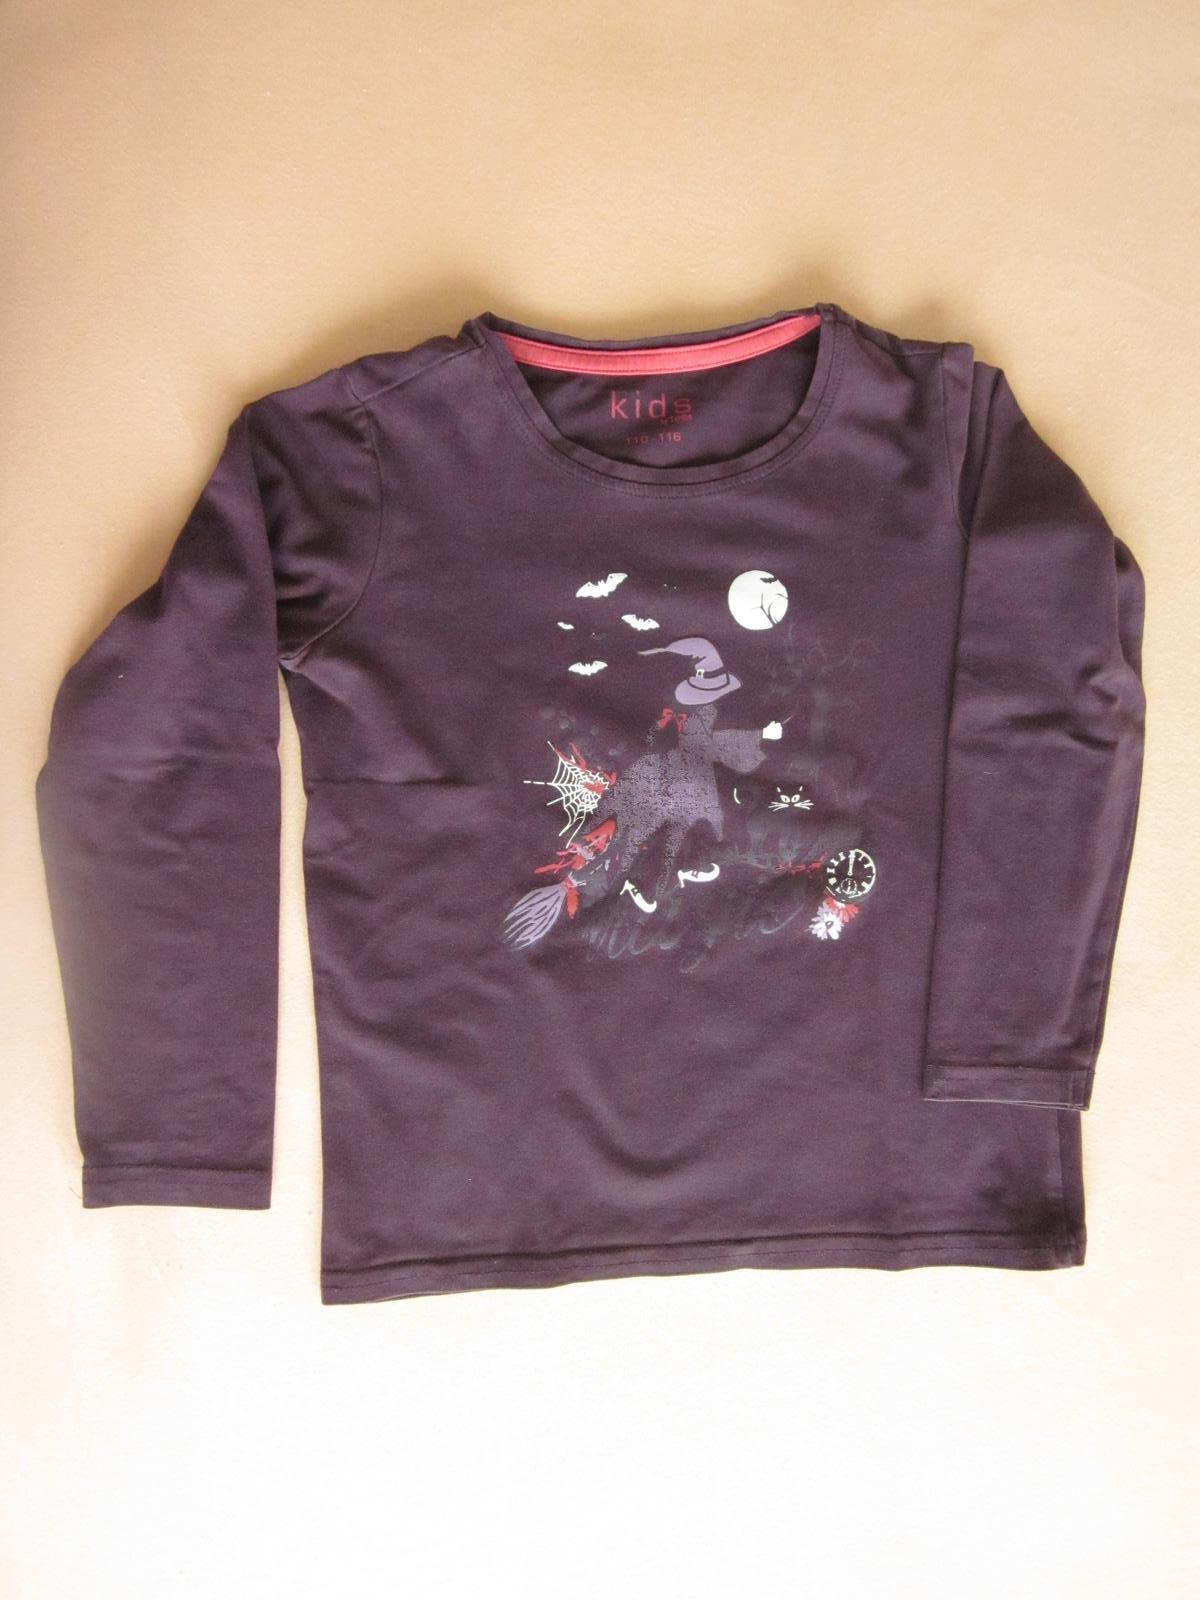 fb3a65eda2cf Svietiace tričko pre dievčatko zn. tchibo